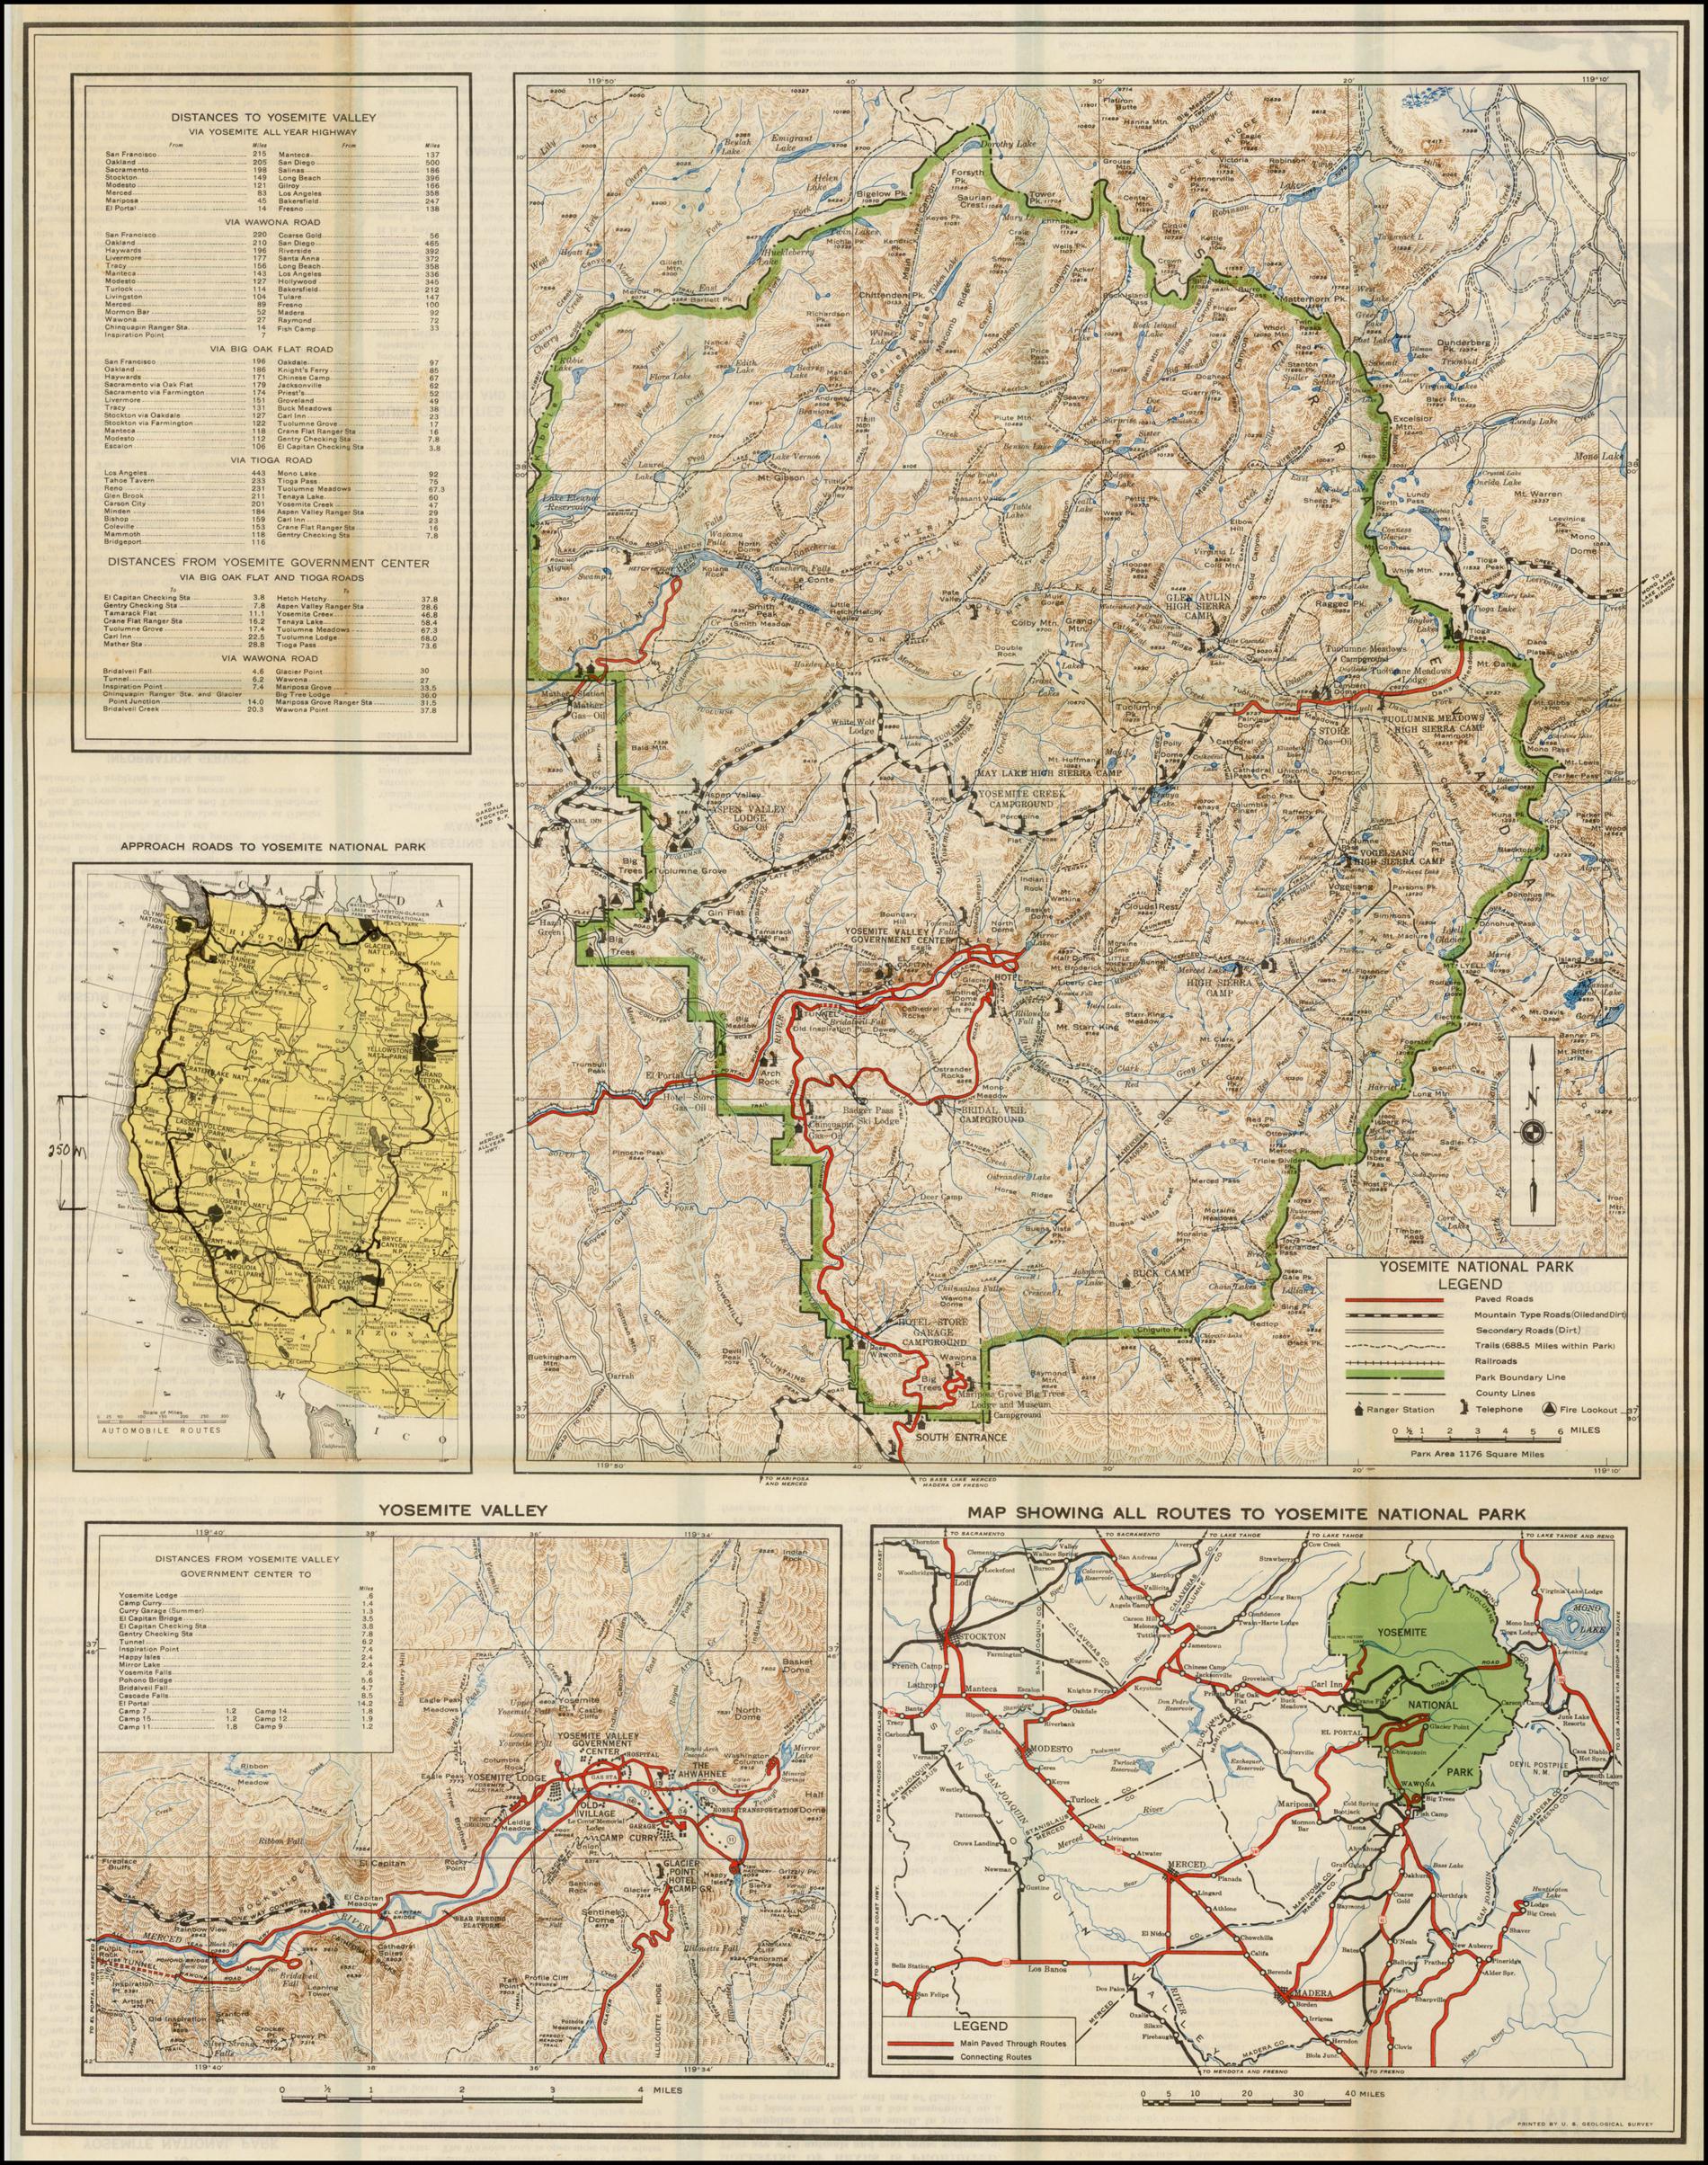 Cartina Yosemite National Park.Guide Map Yosemite National Park 1939 Barry Lawrence Ruderman Antique Maps Inc